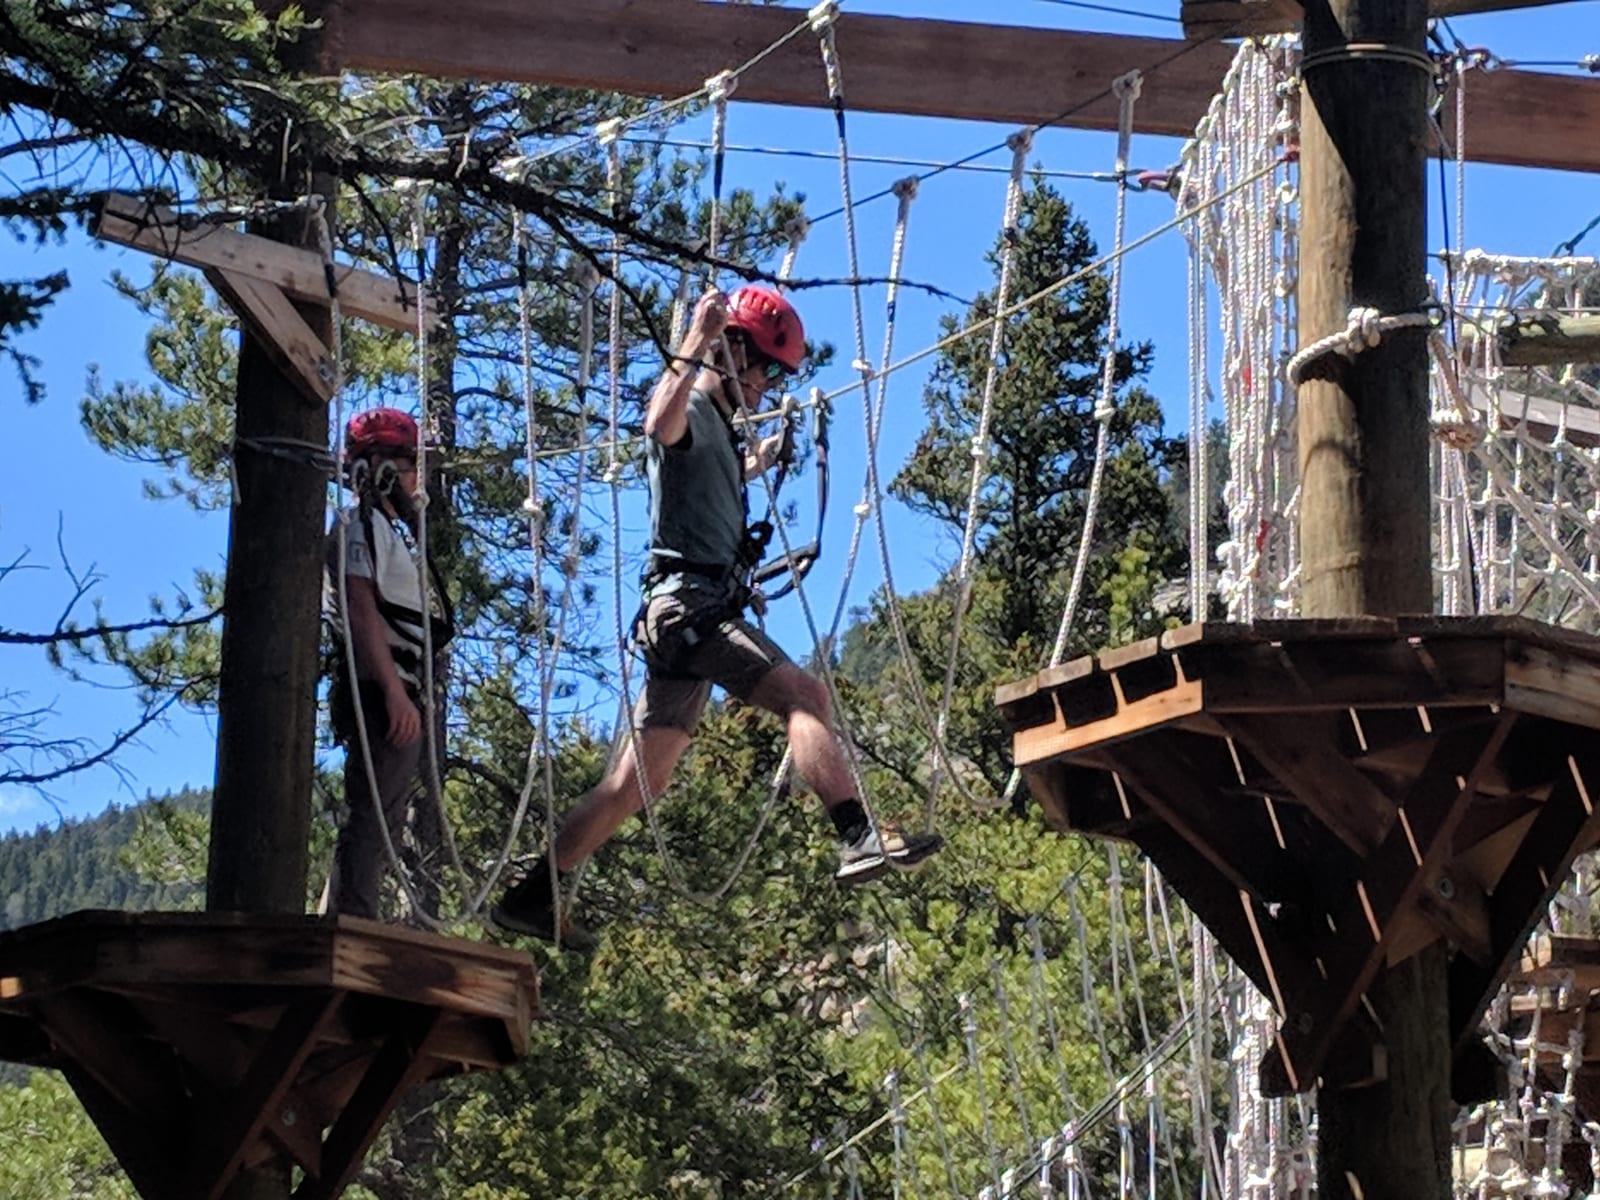 Lawson Adventure Park Resort Aerial Course